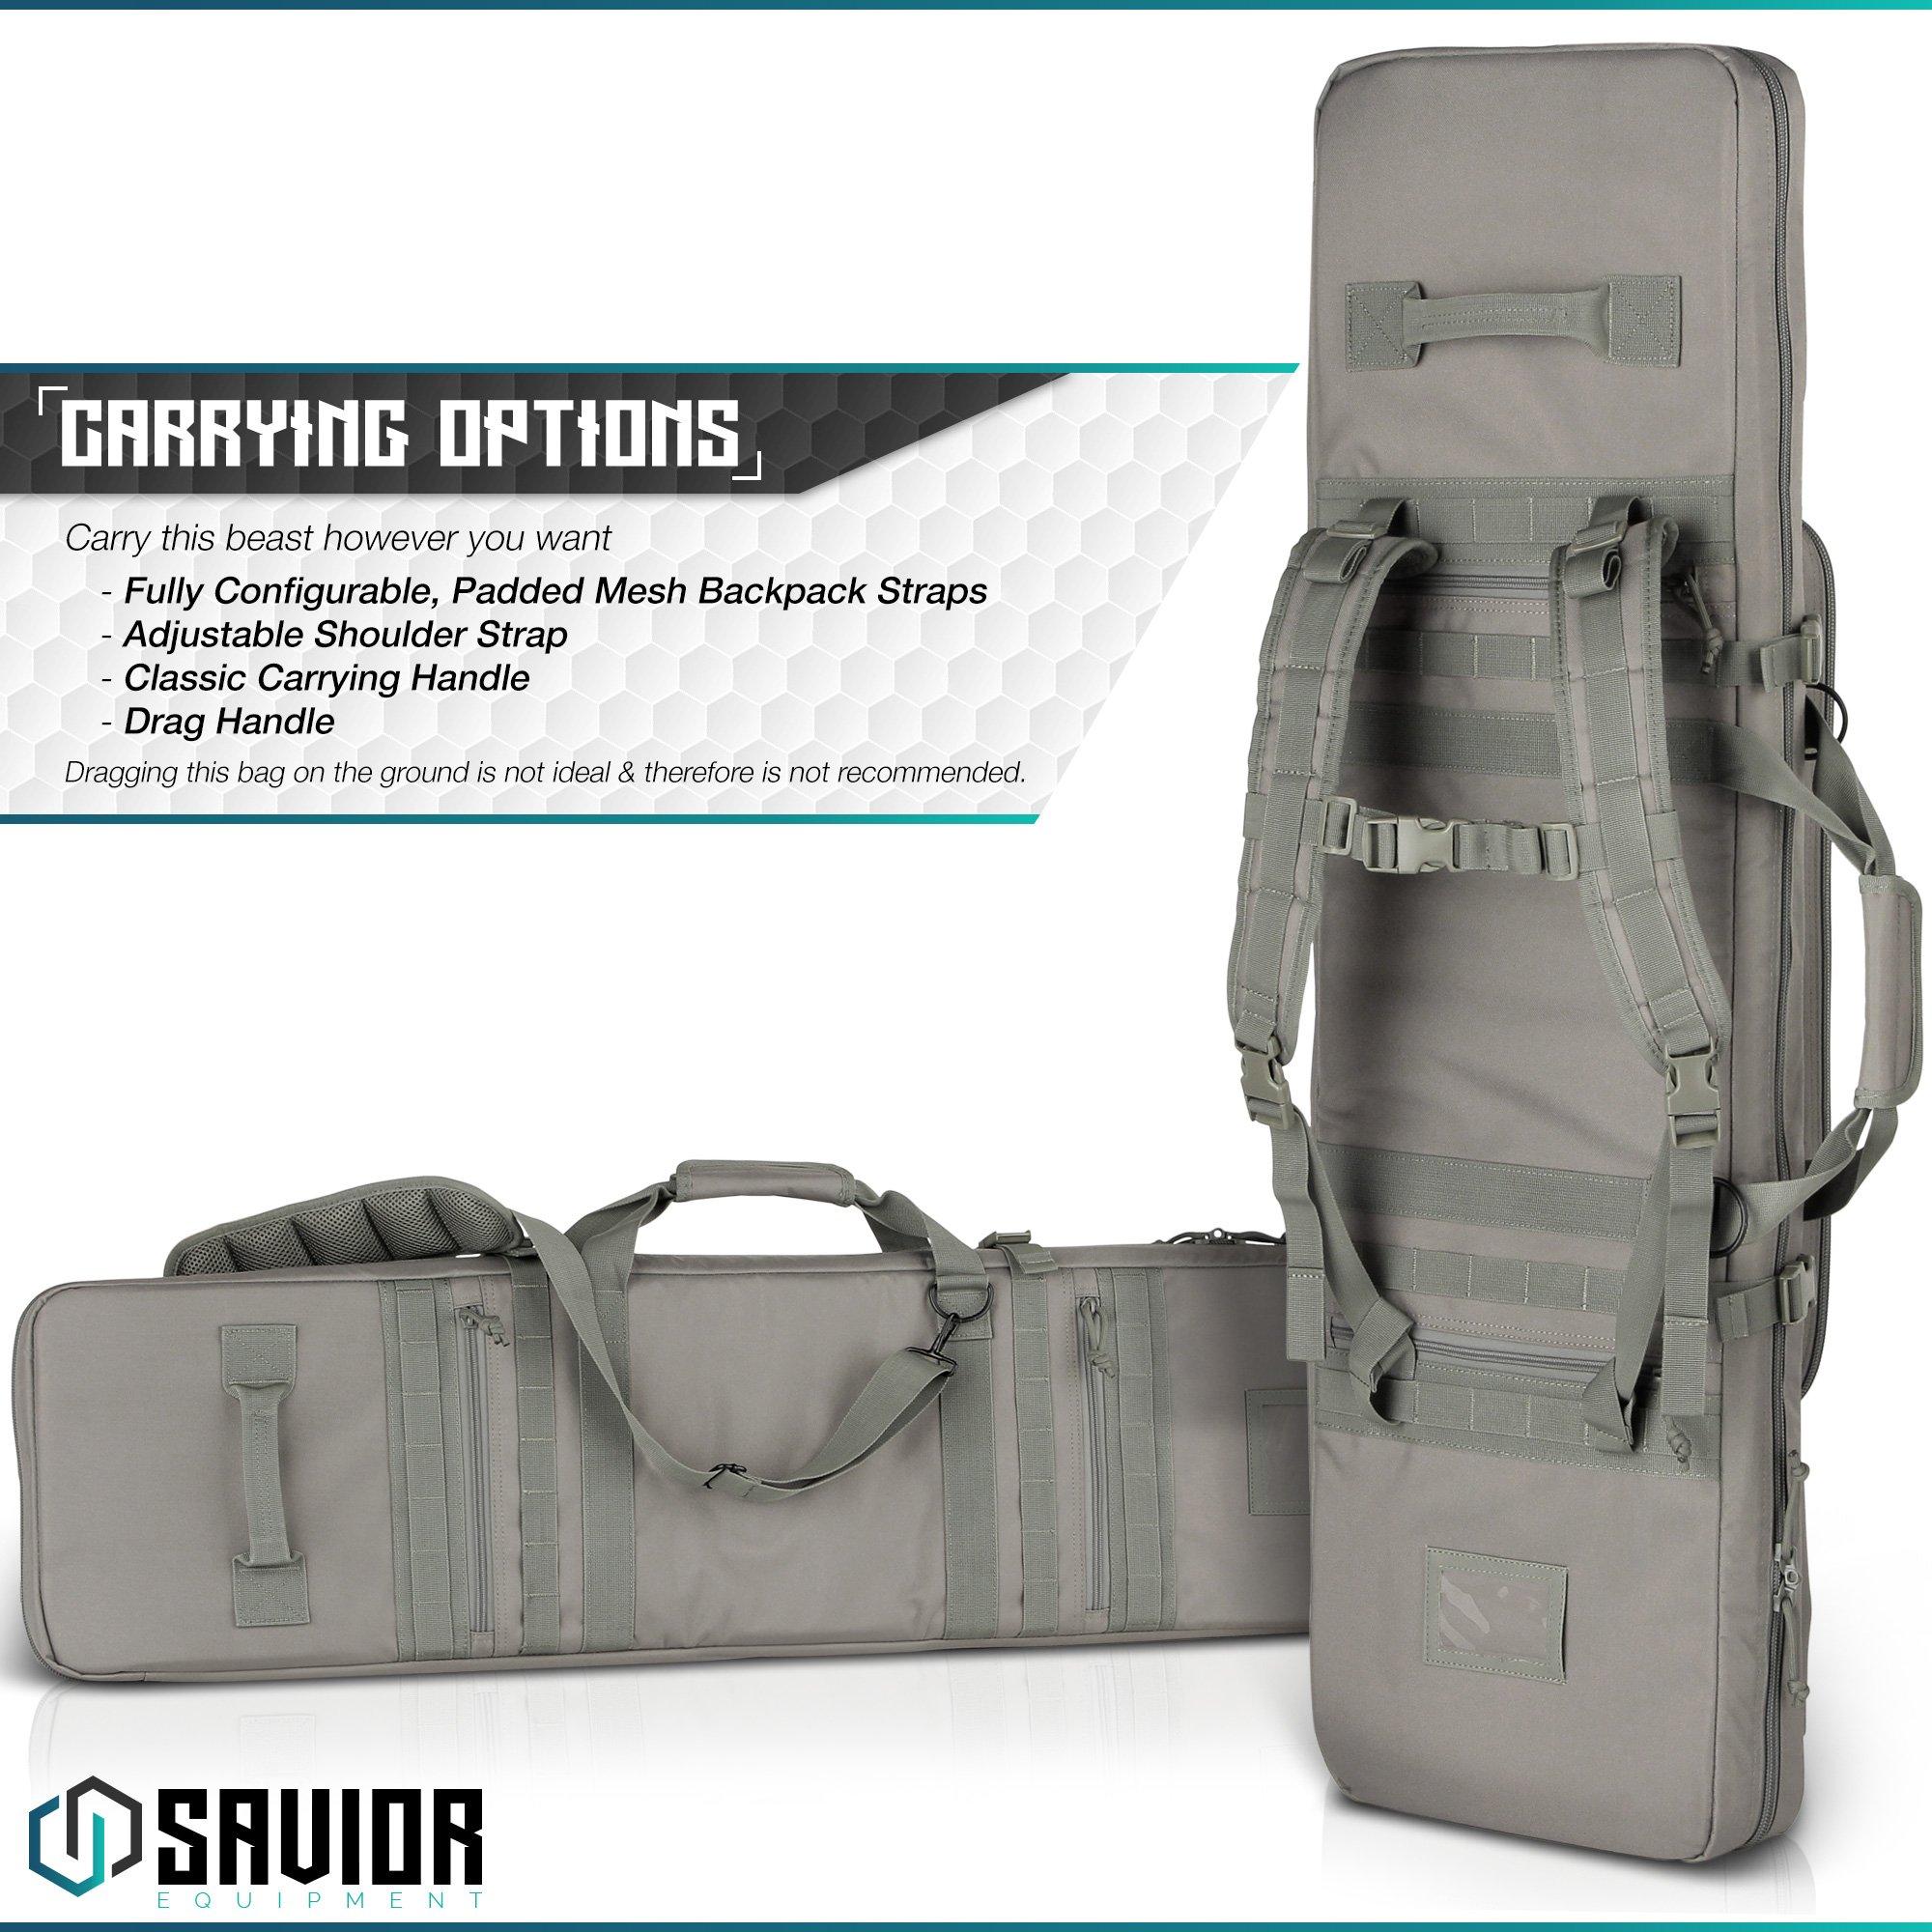 Savior Equipment Urban Warfare Tactical Double Carbine Long Rifle Bag Gun Case Firearm Backpack w/Pistol Handgun Case - 42 Inch Ash Gray by Savior Equipment (Image #6)